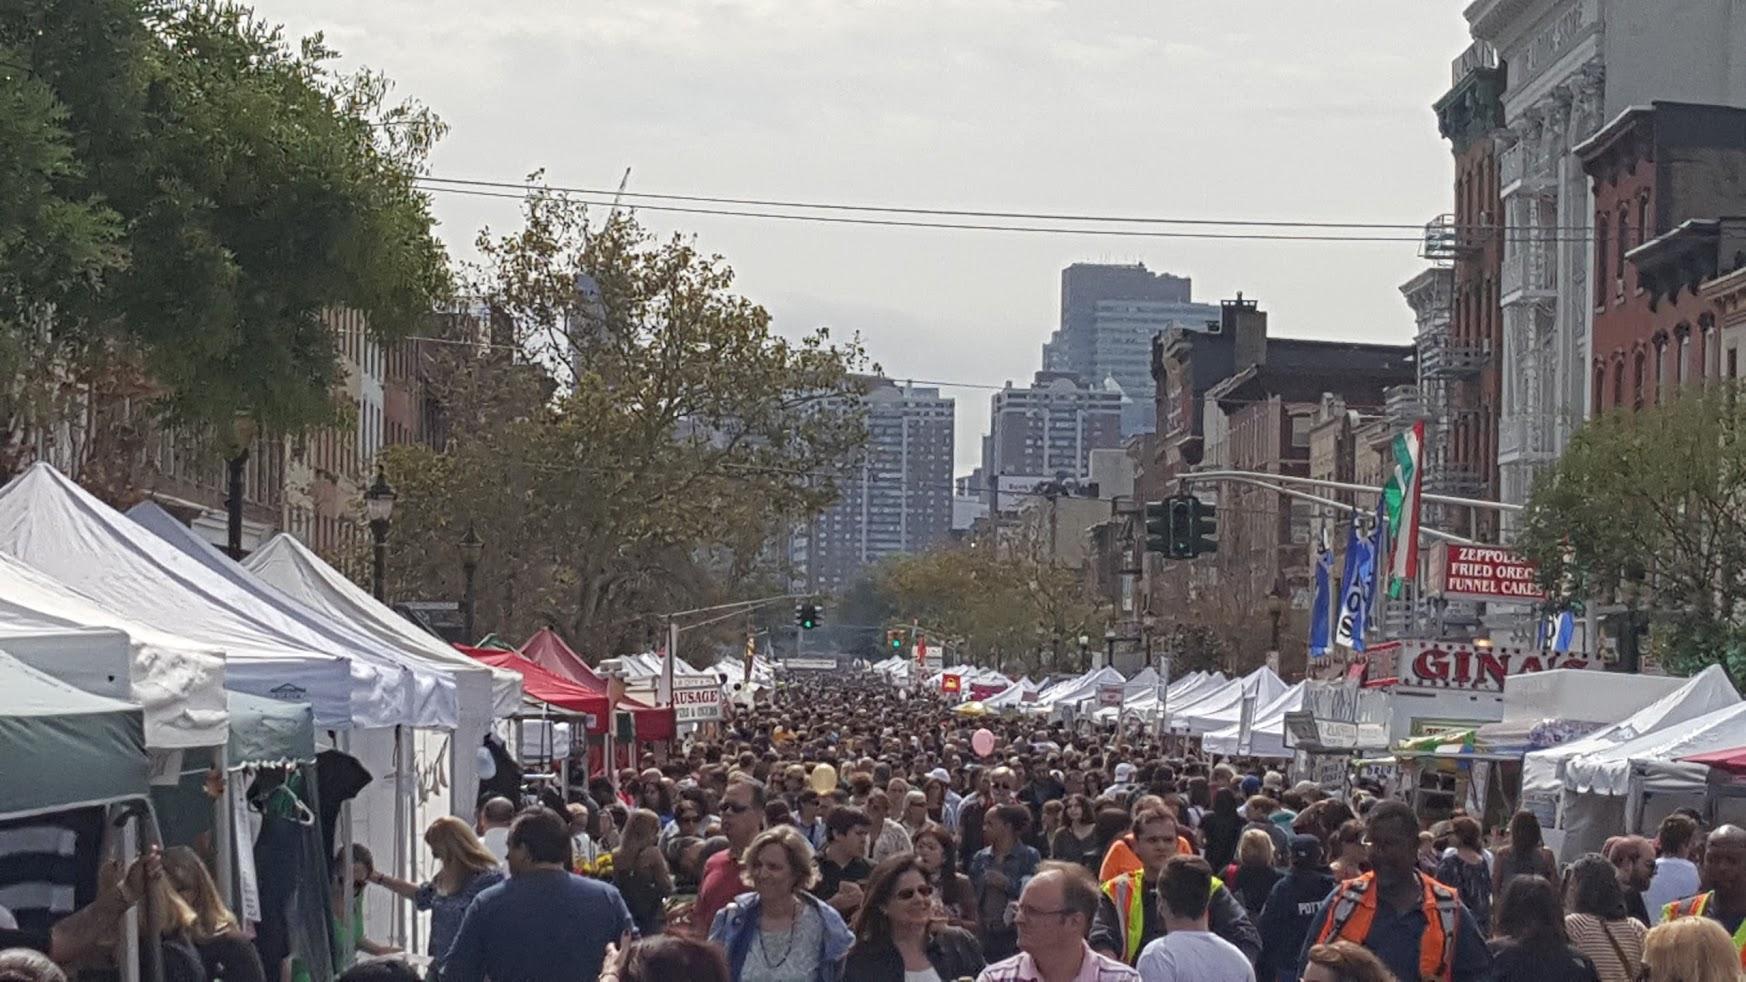 Washington Street during the Hoboken Arts and Music Festival.